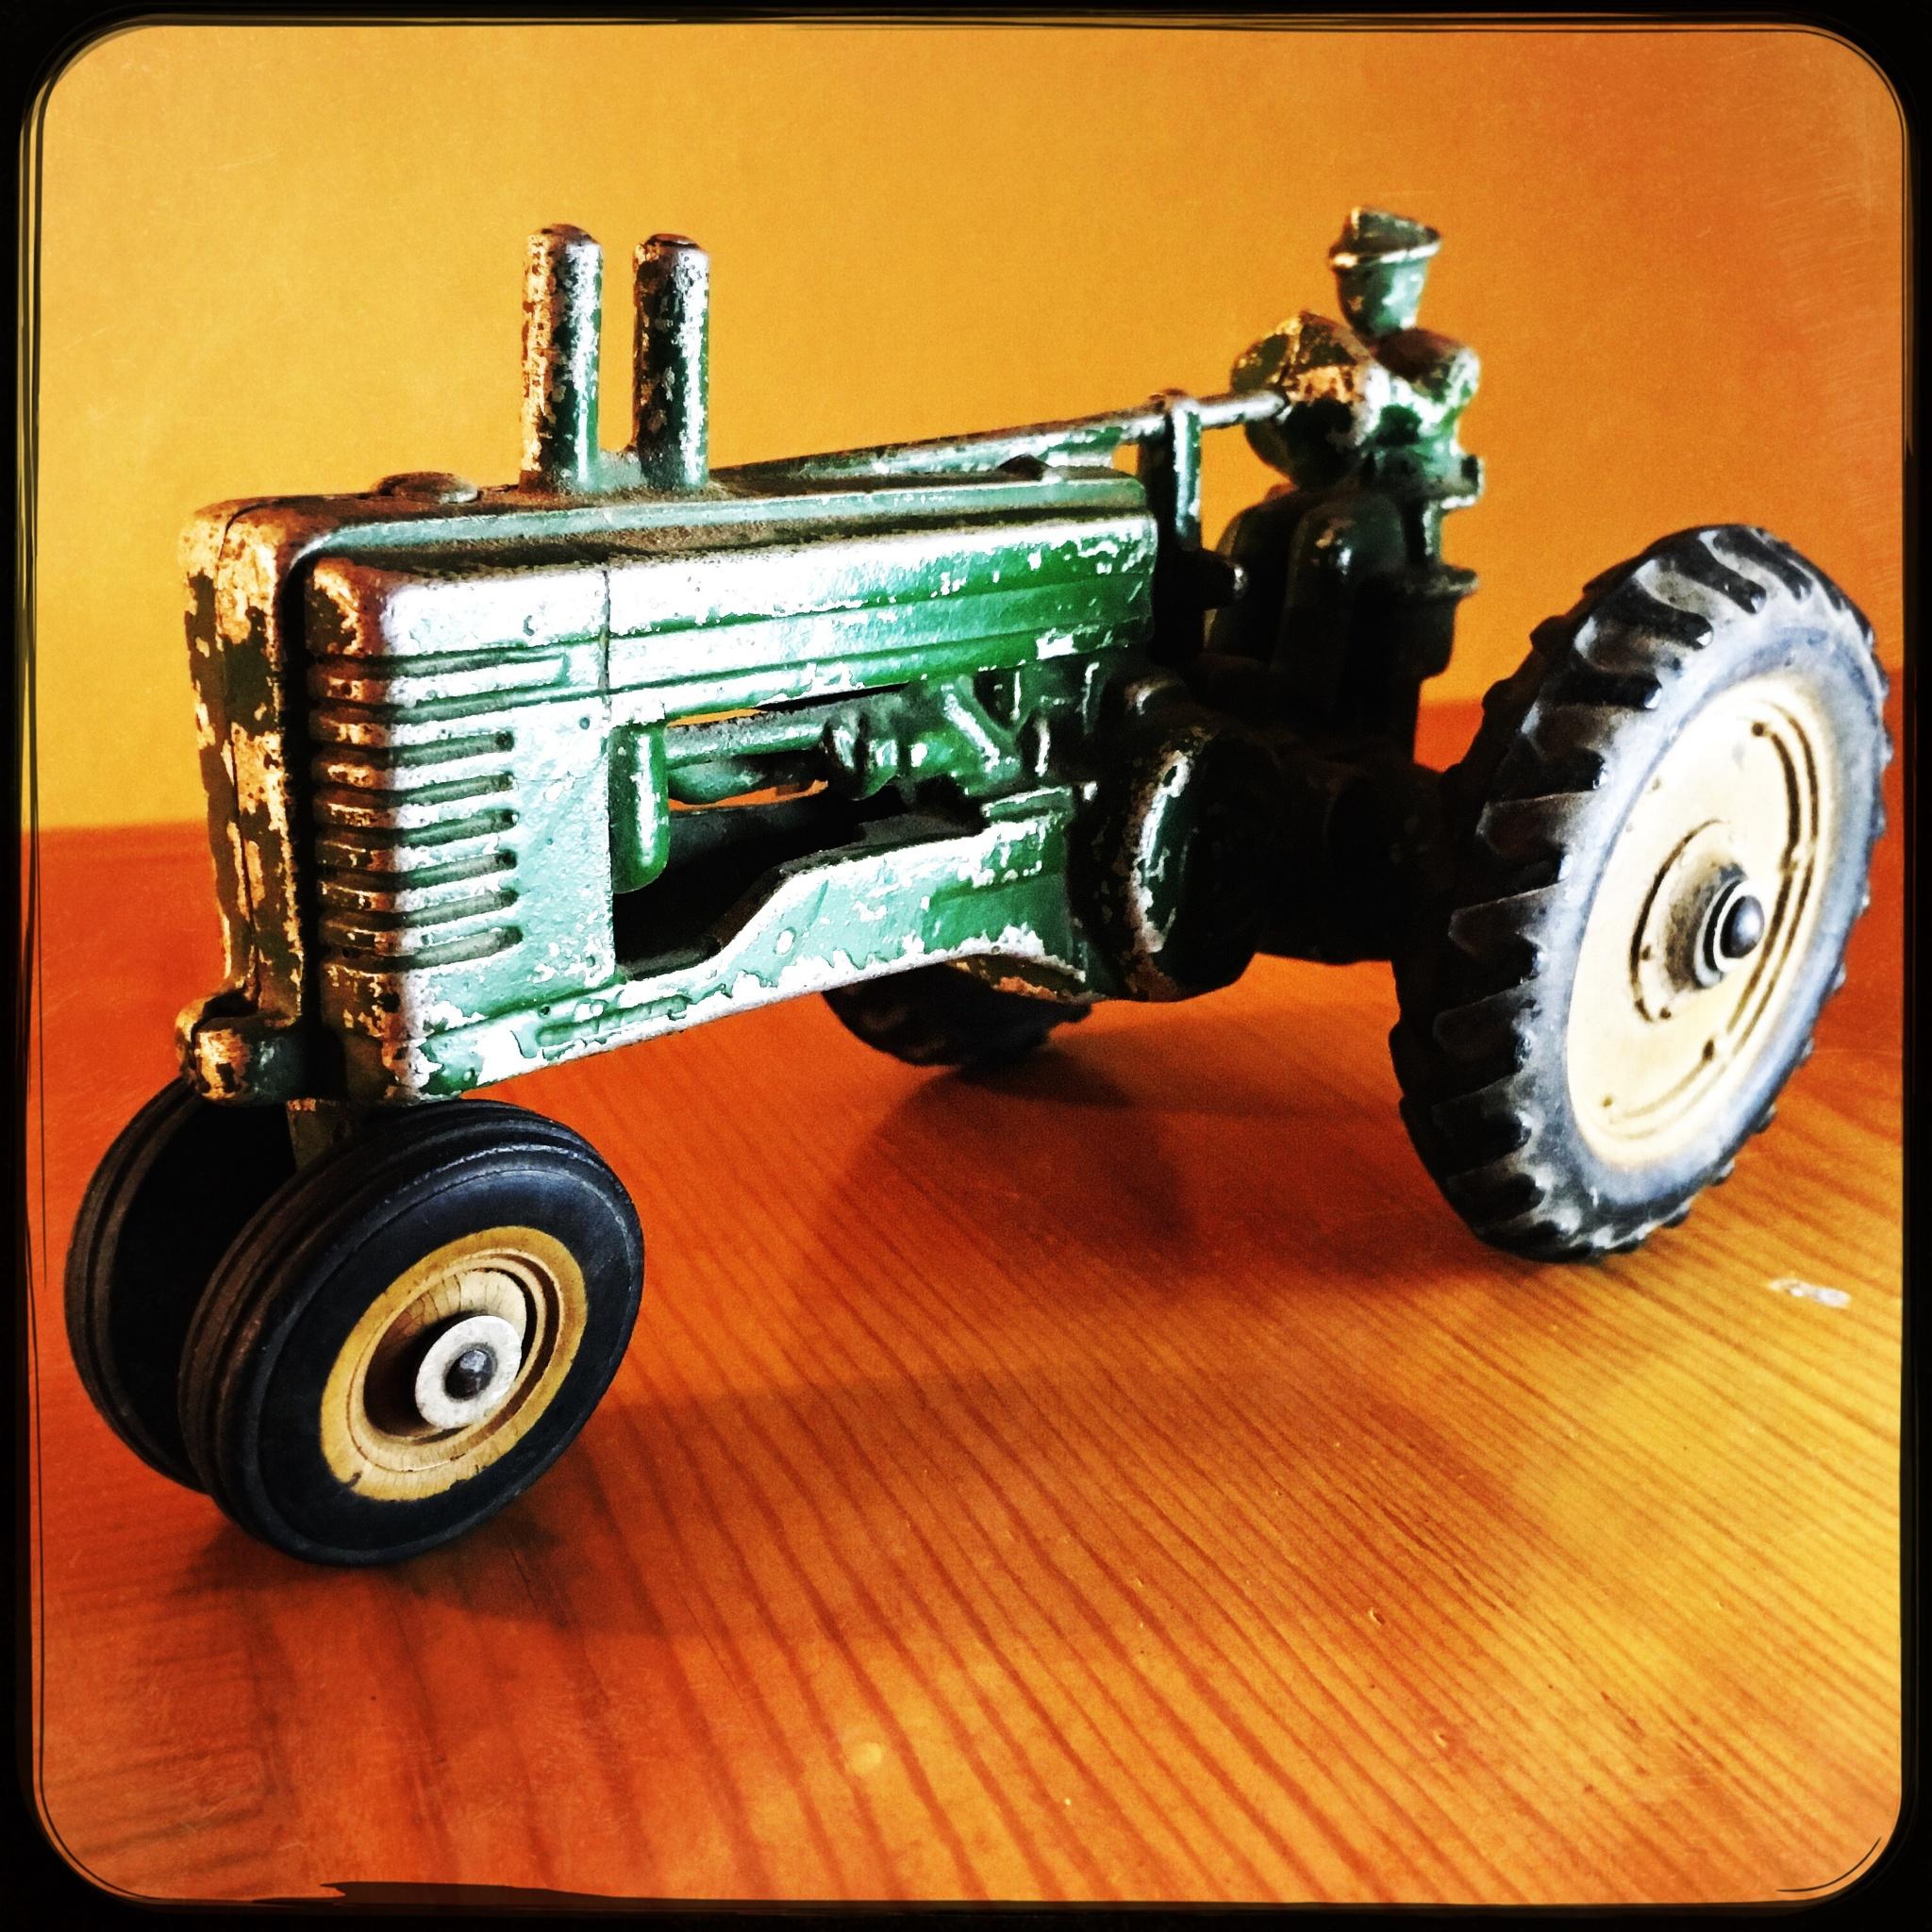 Toy Tractor by Jeff Jones